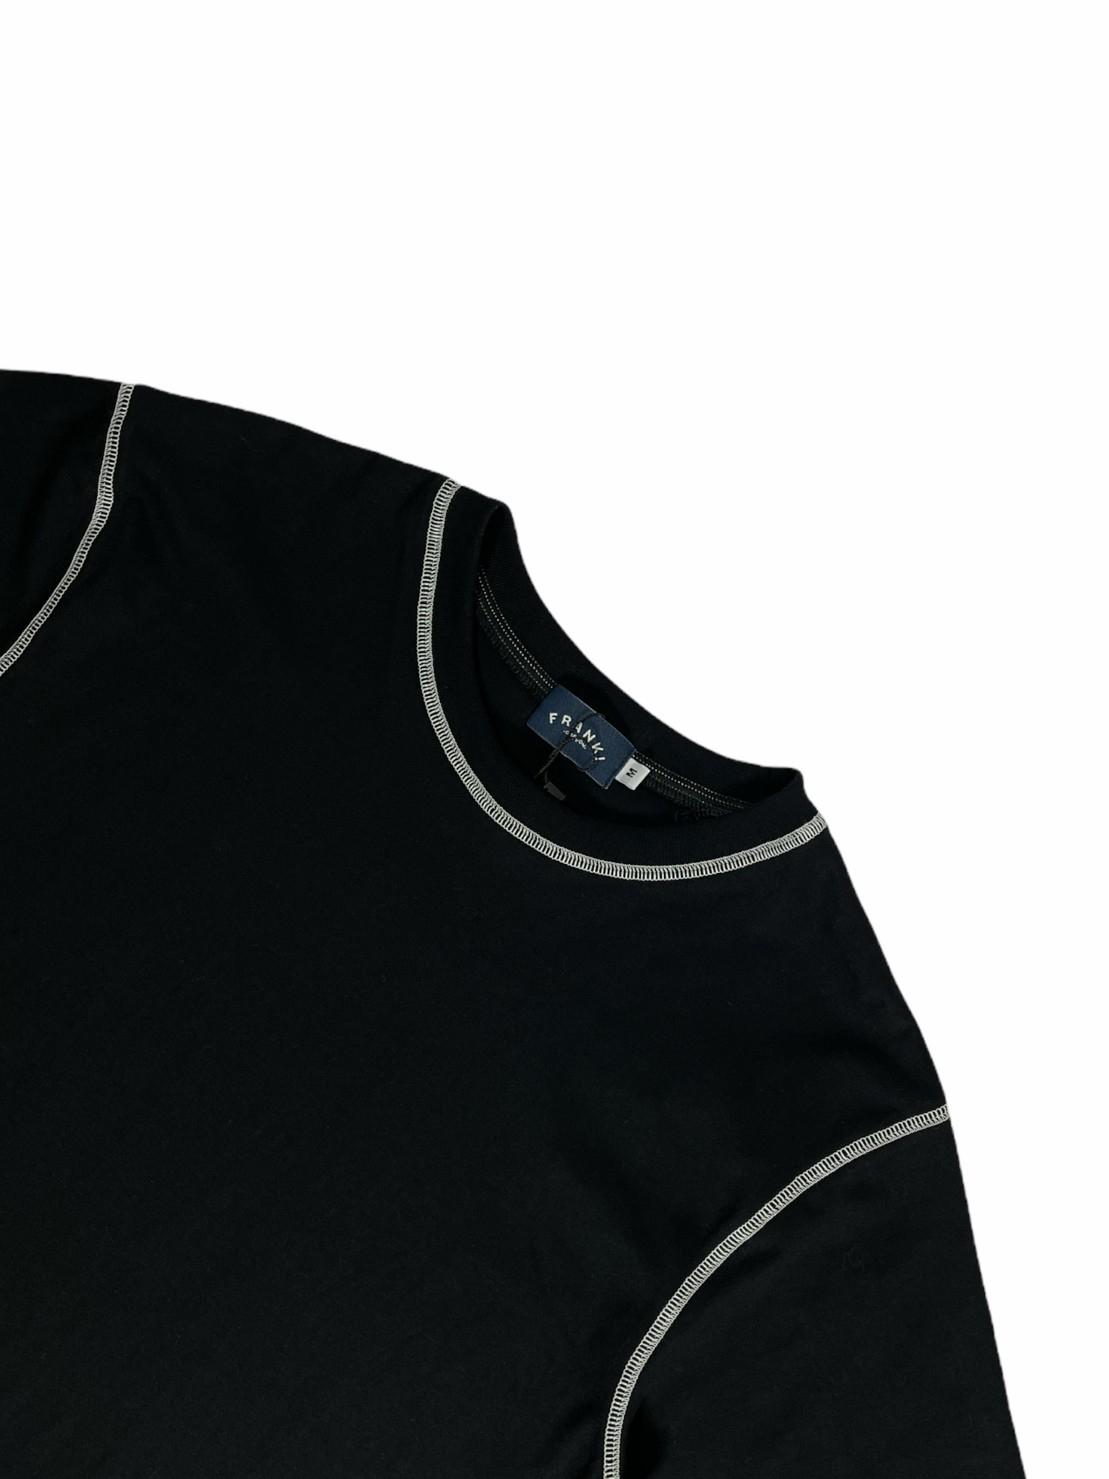 New FRANK! Logo Tee (Black)